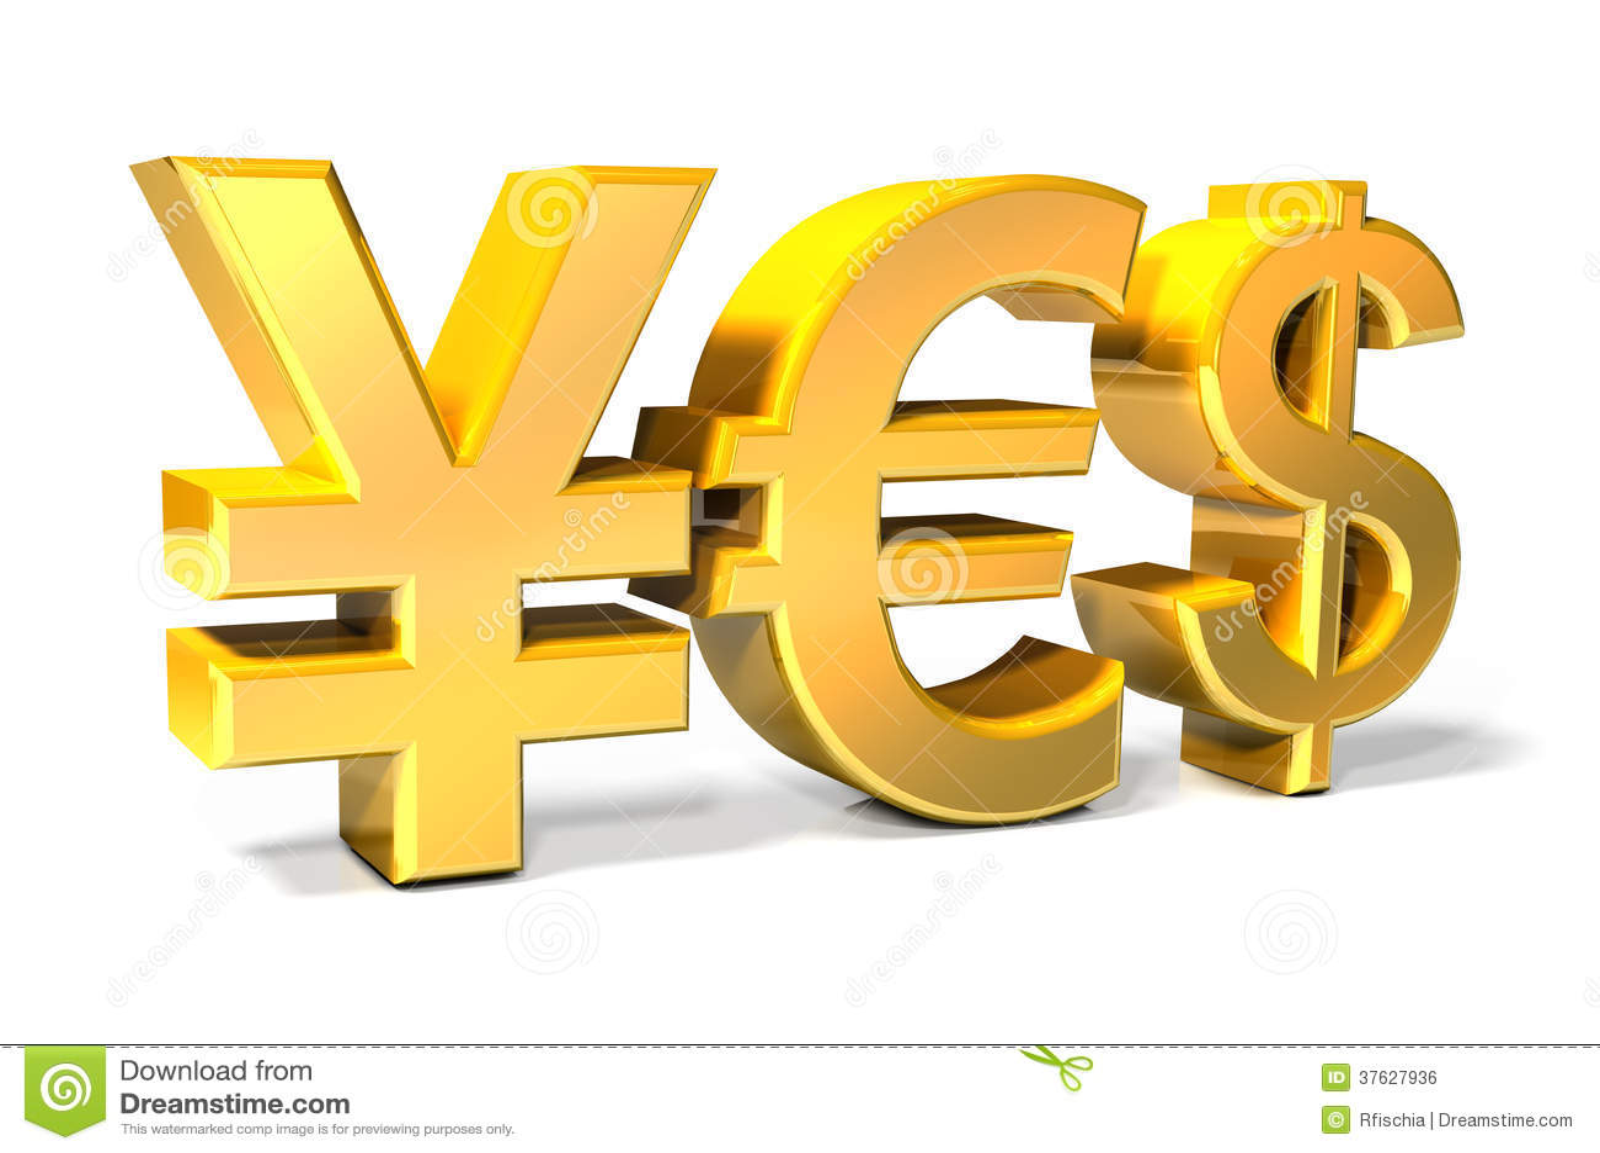 Yes yen euro dollar gold icons stock illustration yes yen euro dollar gold icons biocorpaavc